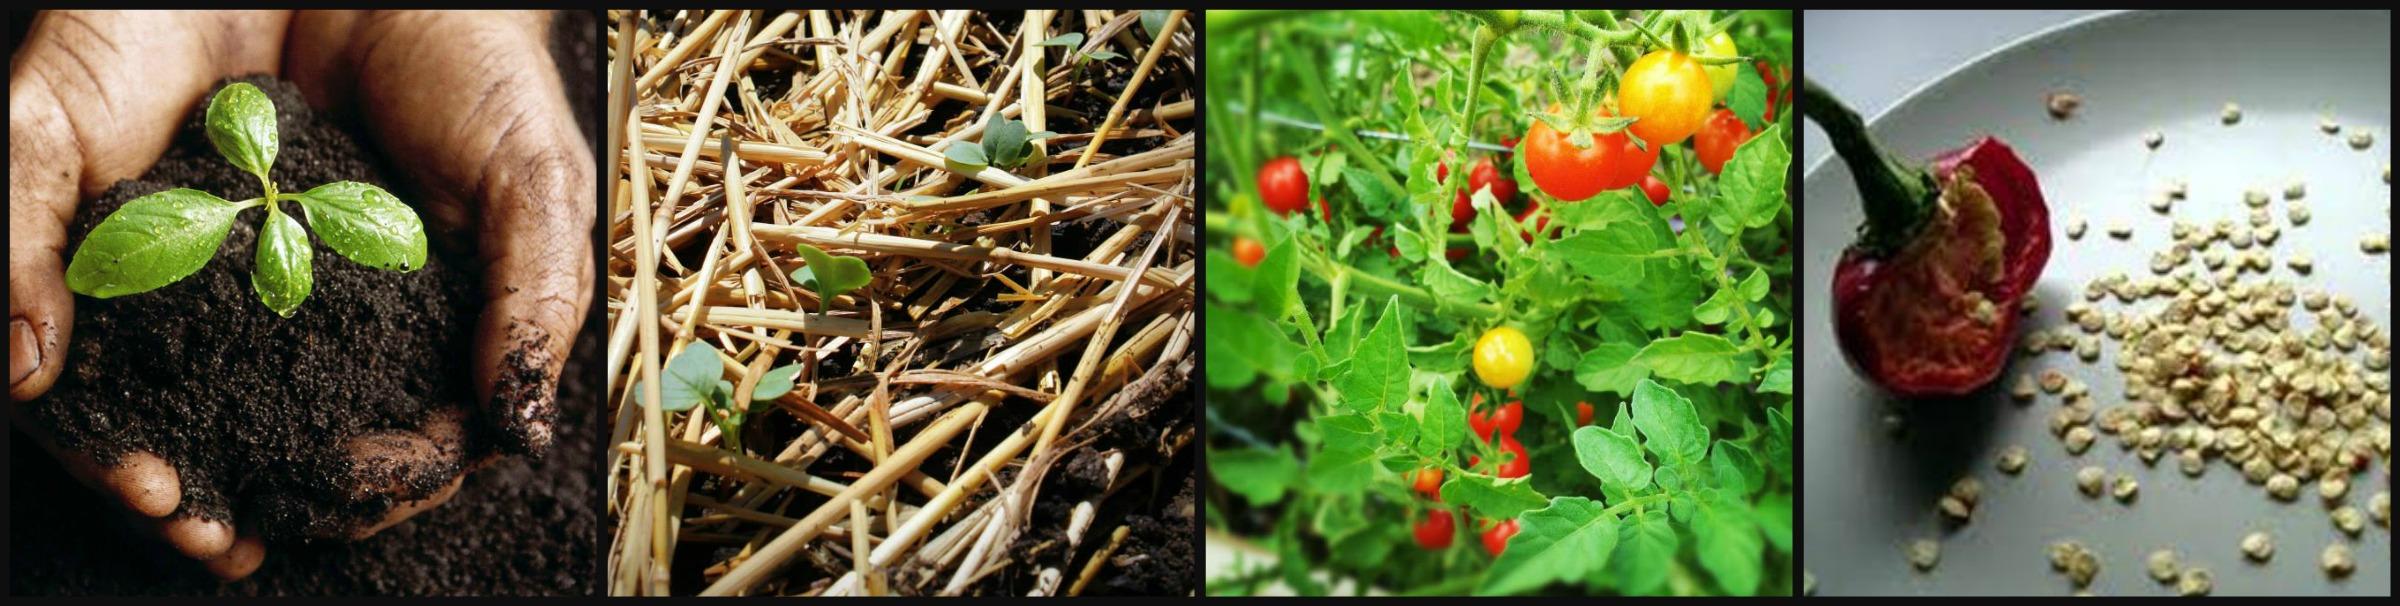 organic garden class collage